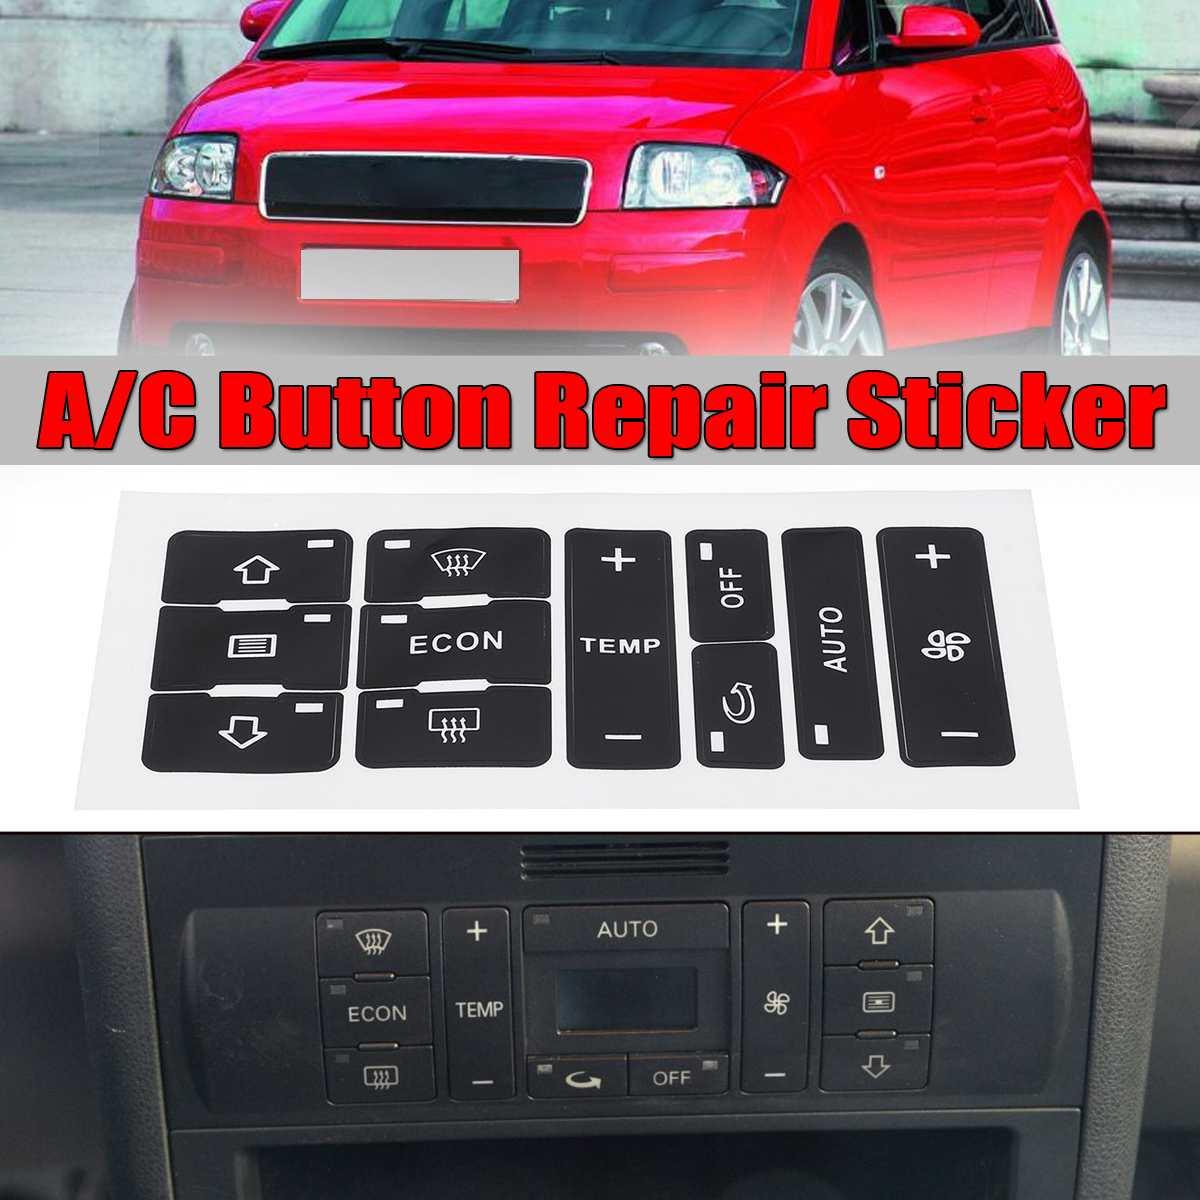 Para Audi A2/ A3 8L/botón C Kit de reparación de arreglar lavado coche feo pegatinas condición de aire del coche interruptor de Control de botón pegatinas para reparar